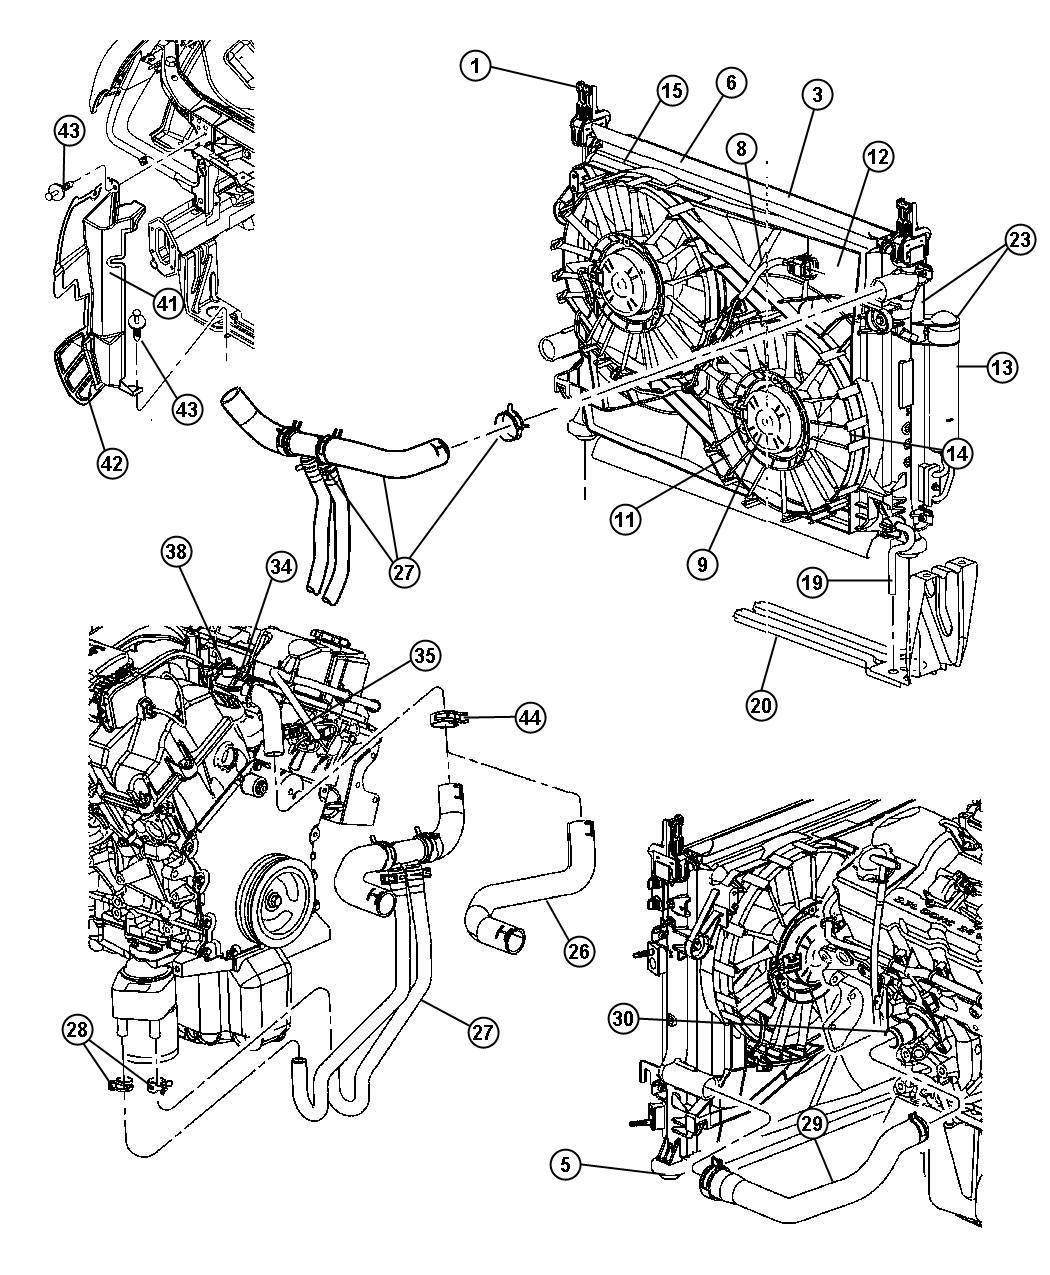 tags: #gm headlight wiring diagram#ktm headlight wiring diagram#freightliner  mirror wiring diagram#harley davidson headlight wiring diagram#kubota  headlight